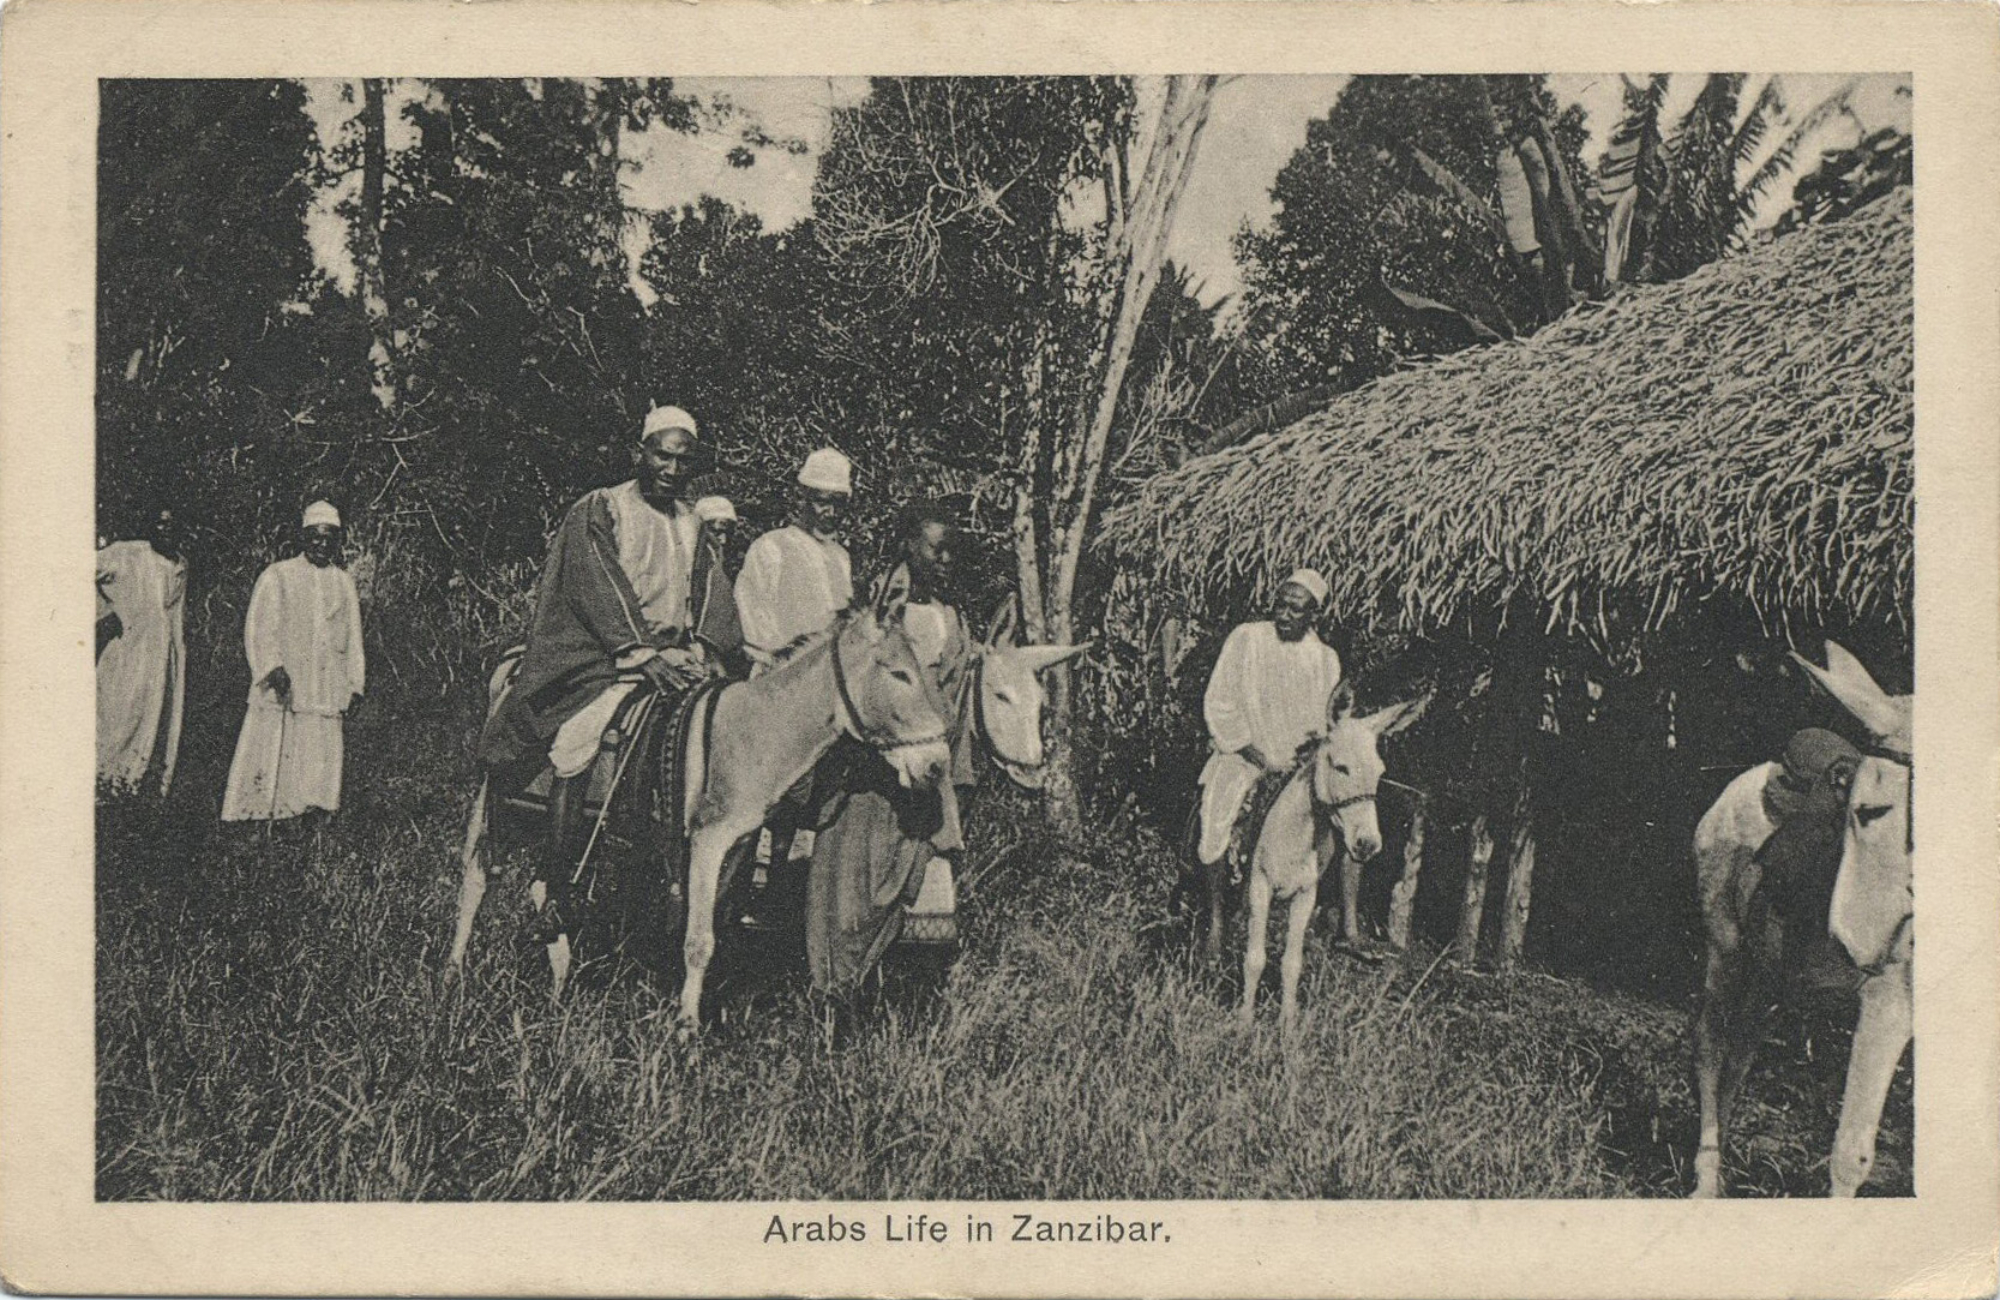 Ali bin Towar: The role of Arabs in Zanzibar surpasses that of the Portuguese